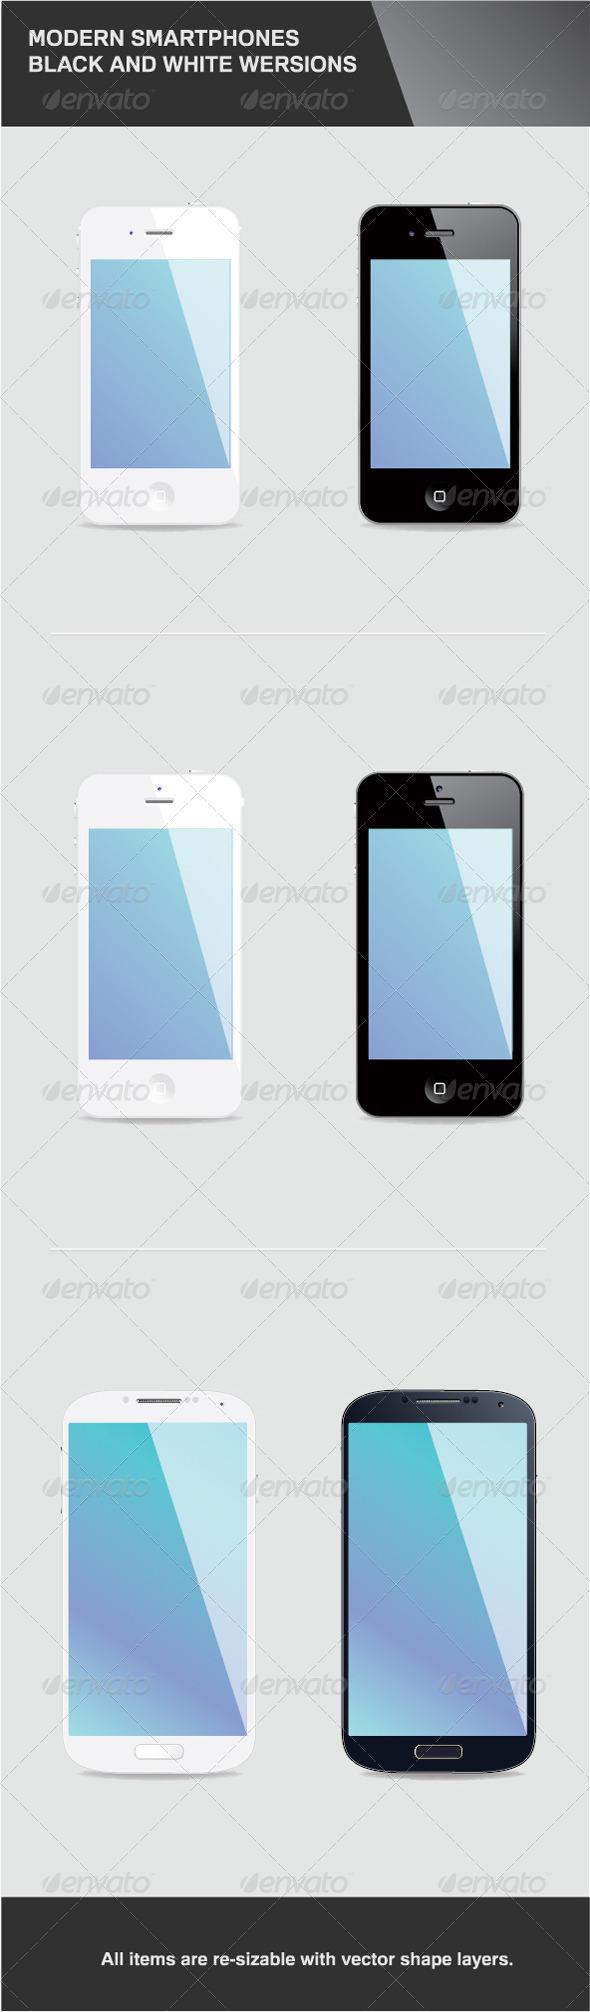 6 Modern Smartphones - Communications Technology